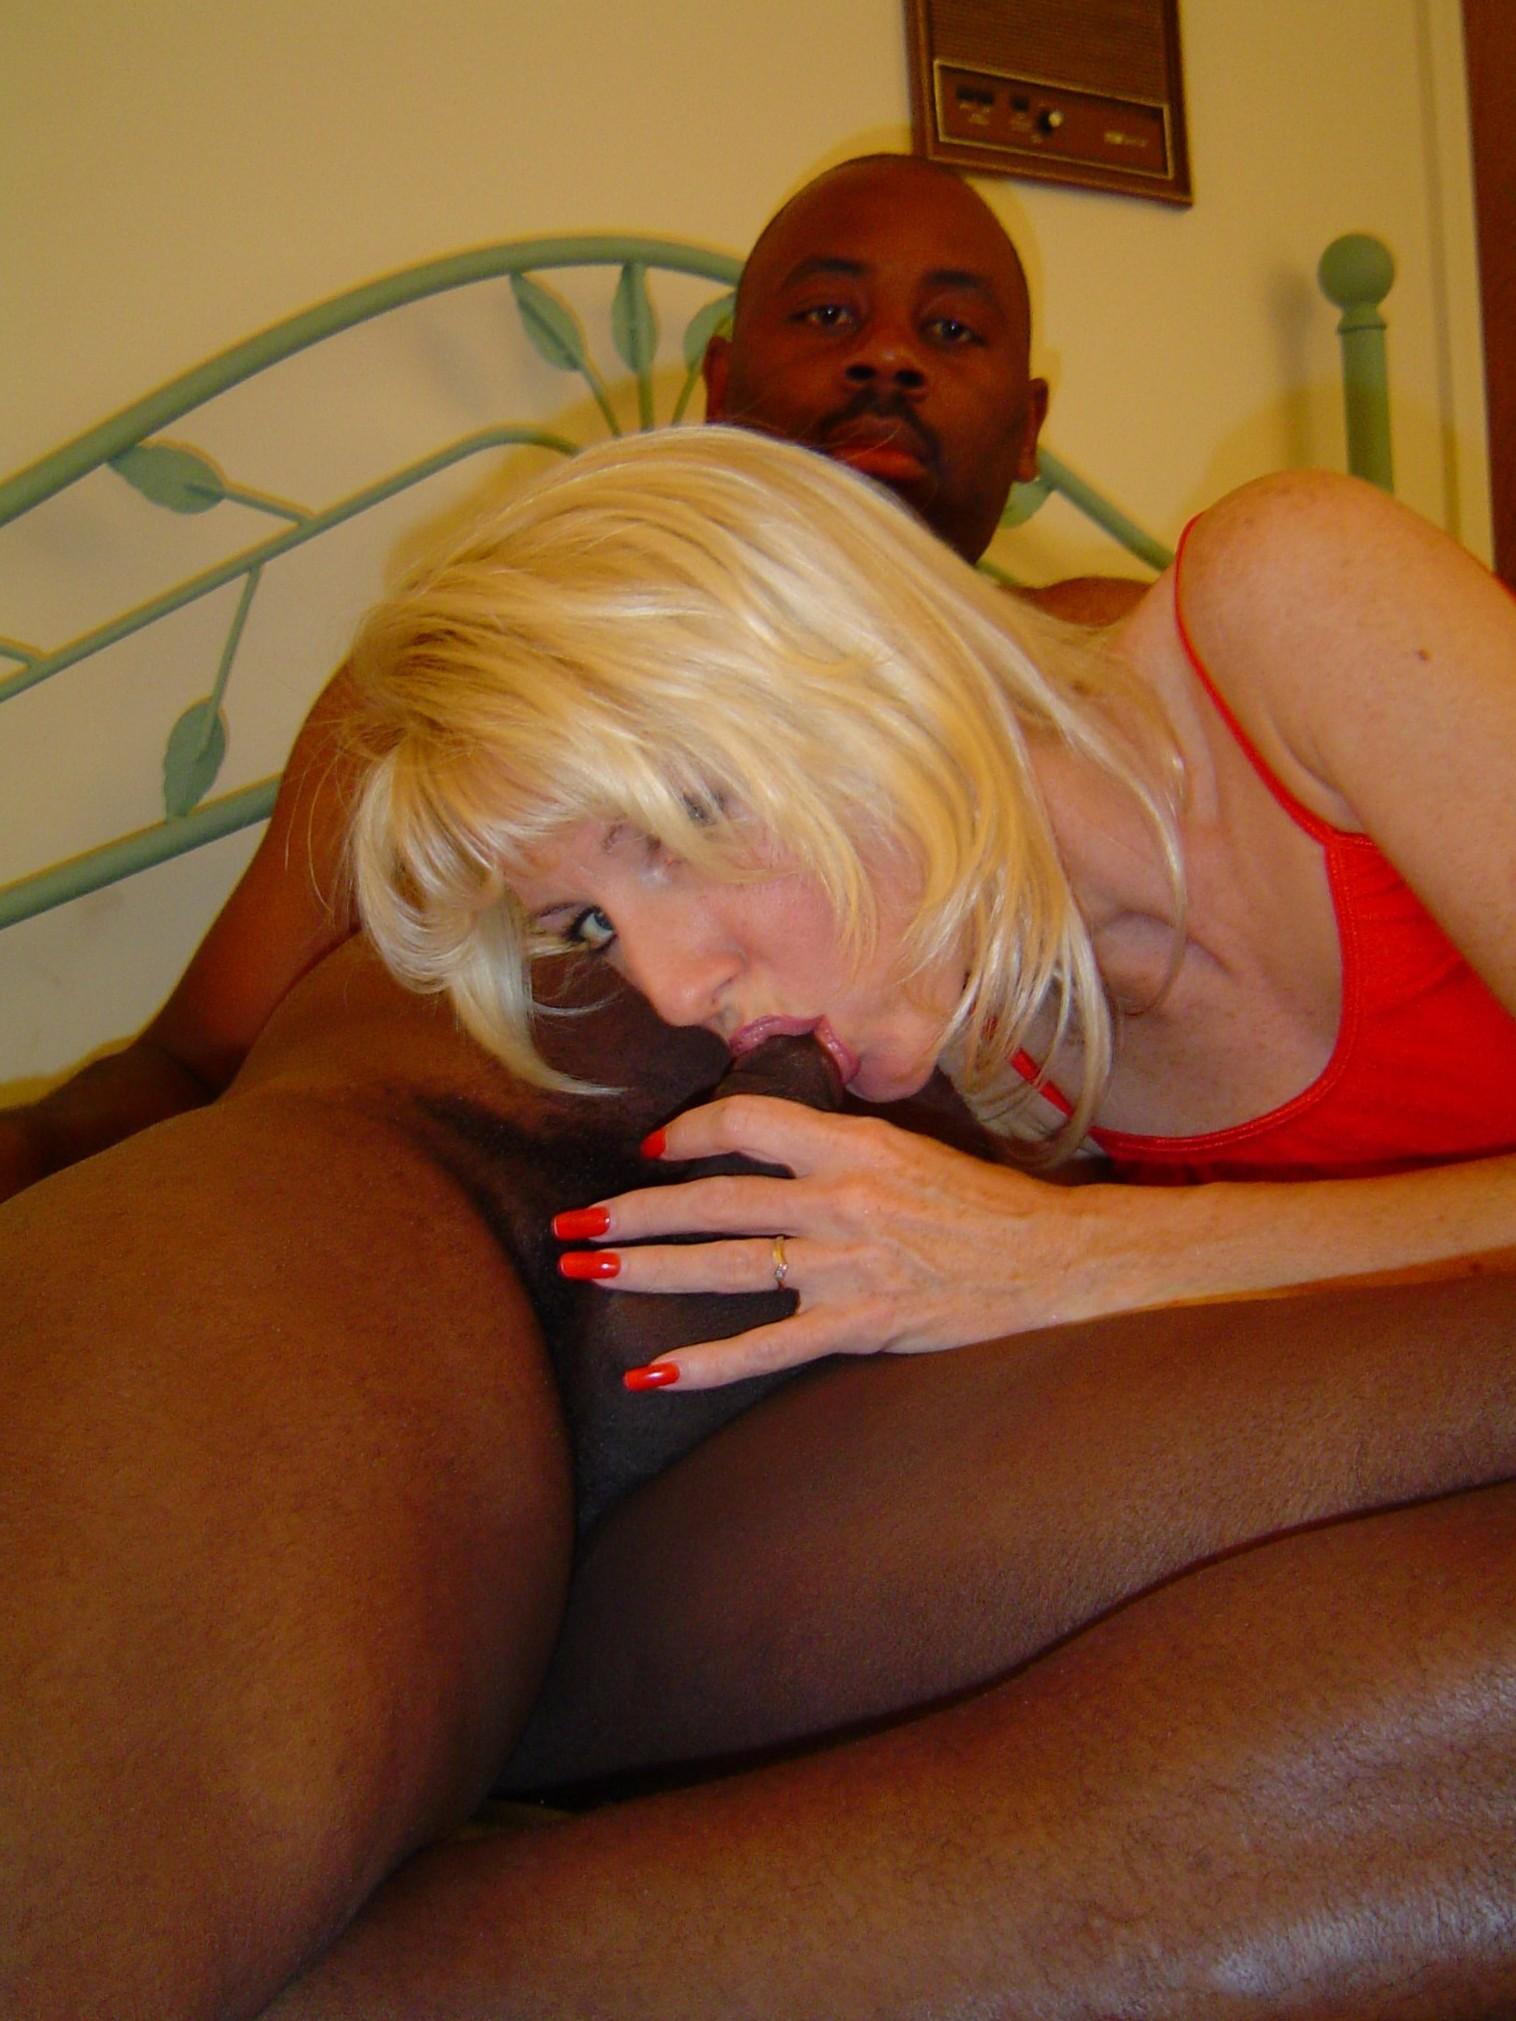 blonde whore sucking